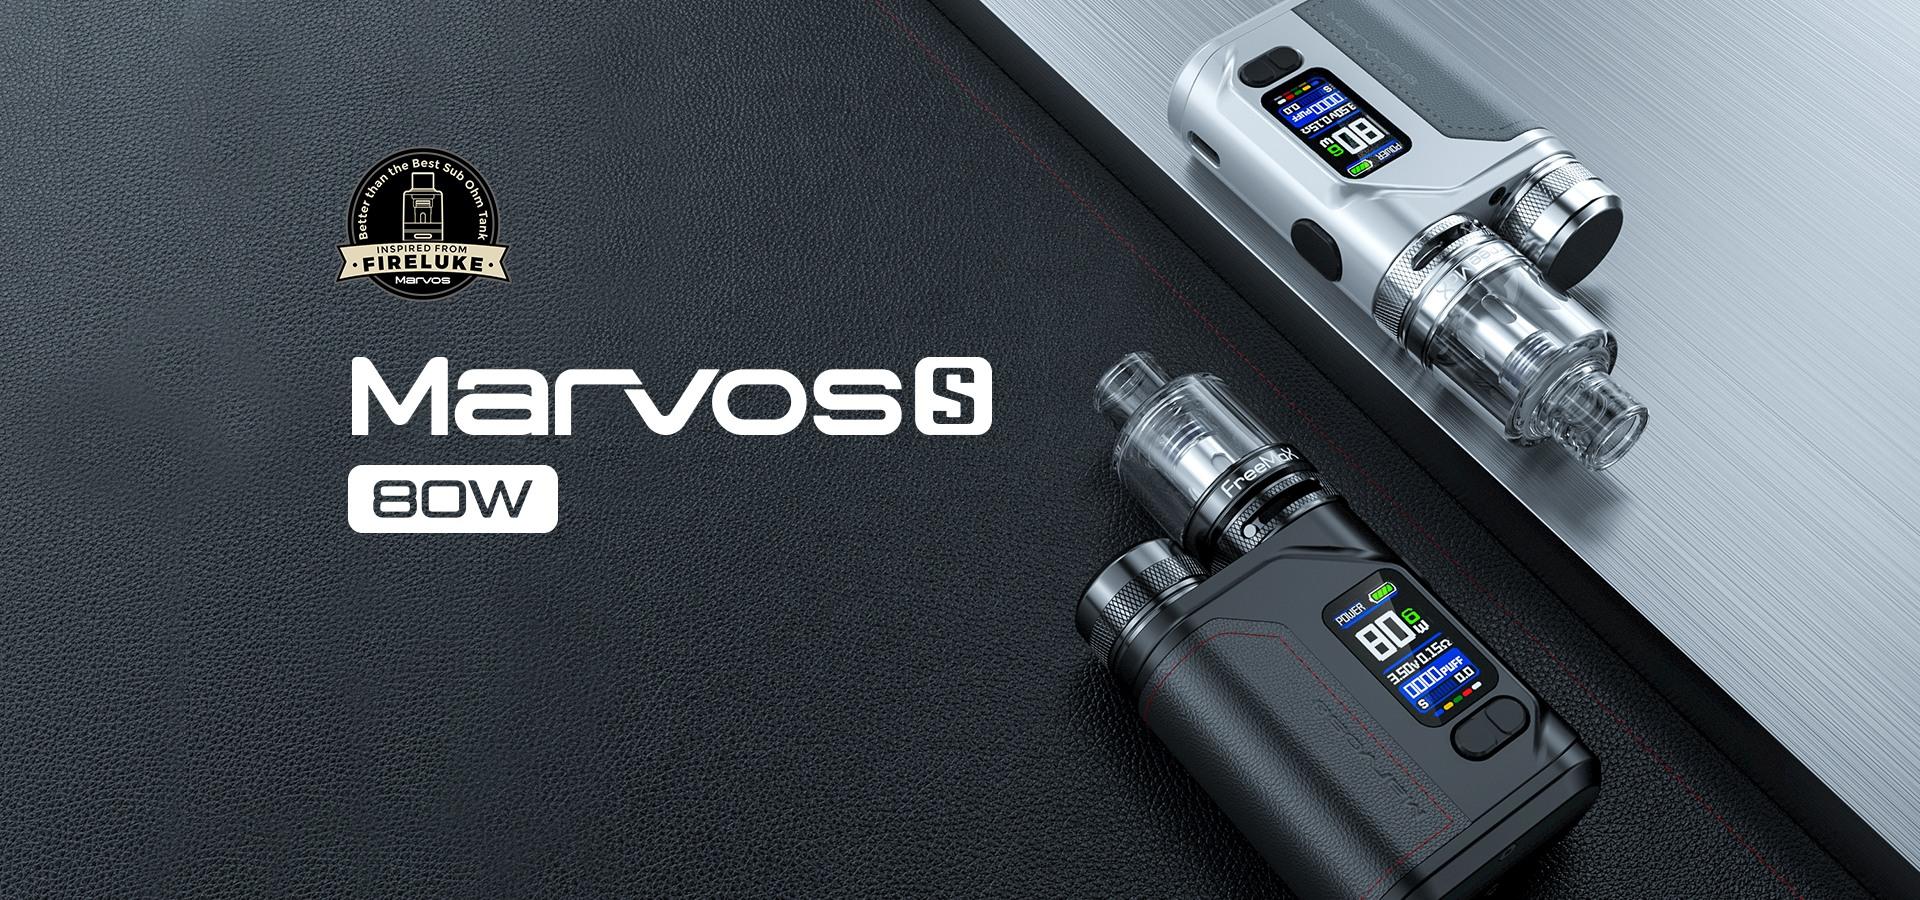 Marvos s 80w kit - banner